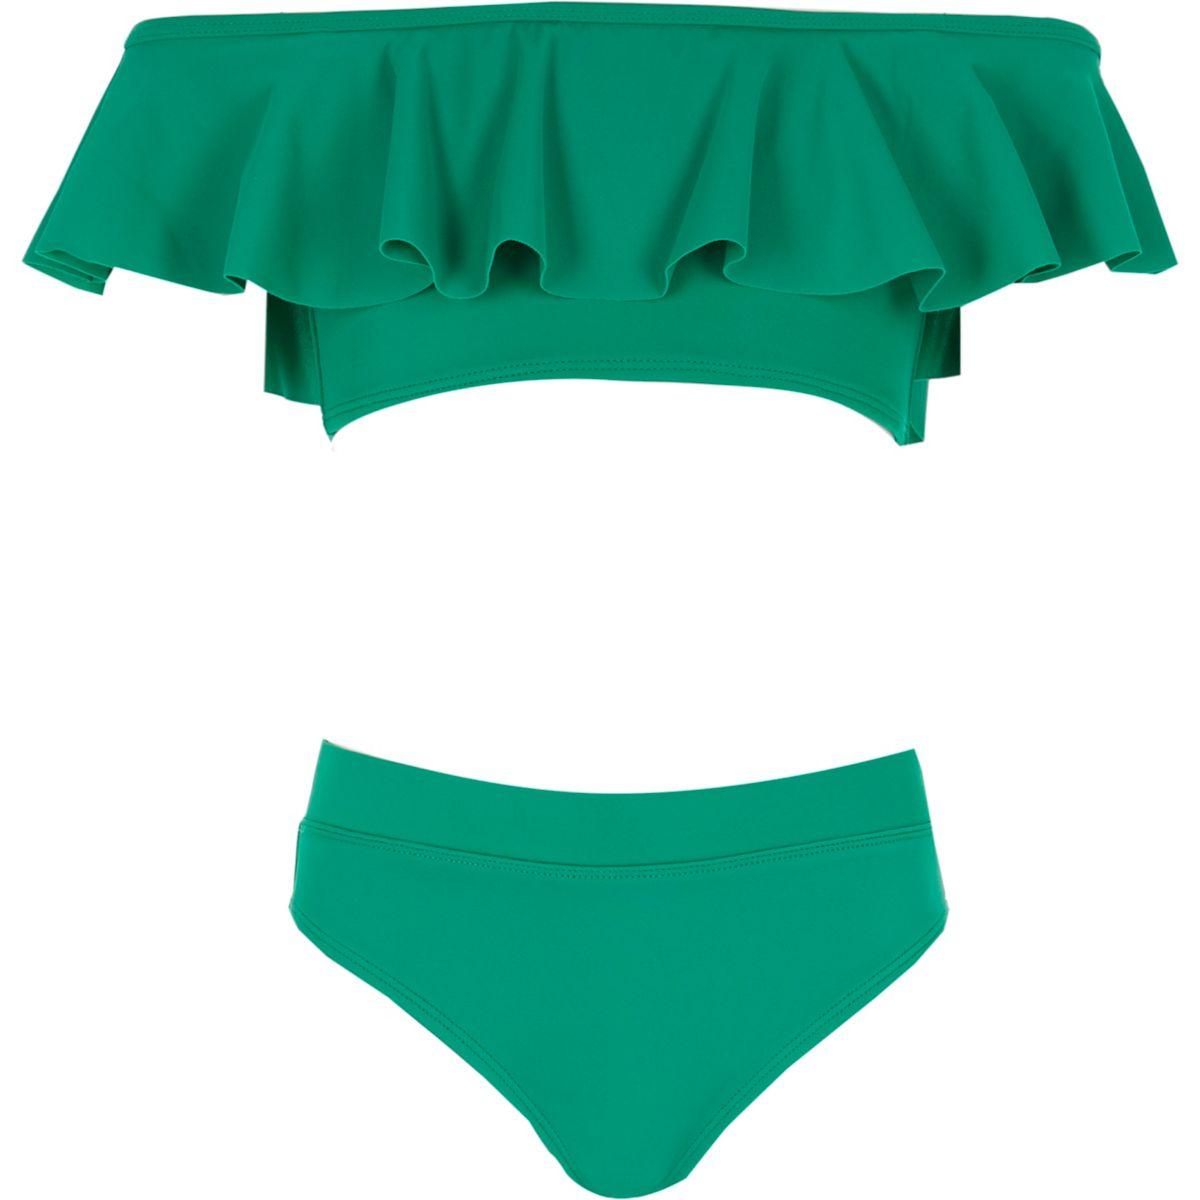 Grüner Bardot-Bikini mit Rüschen